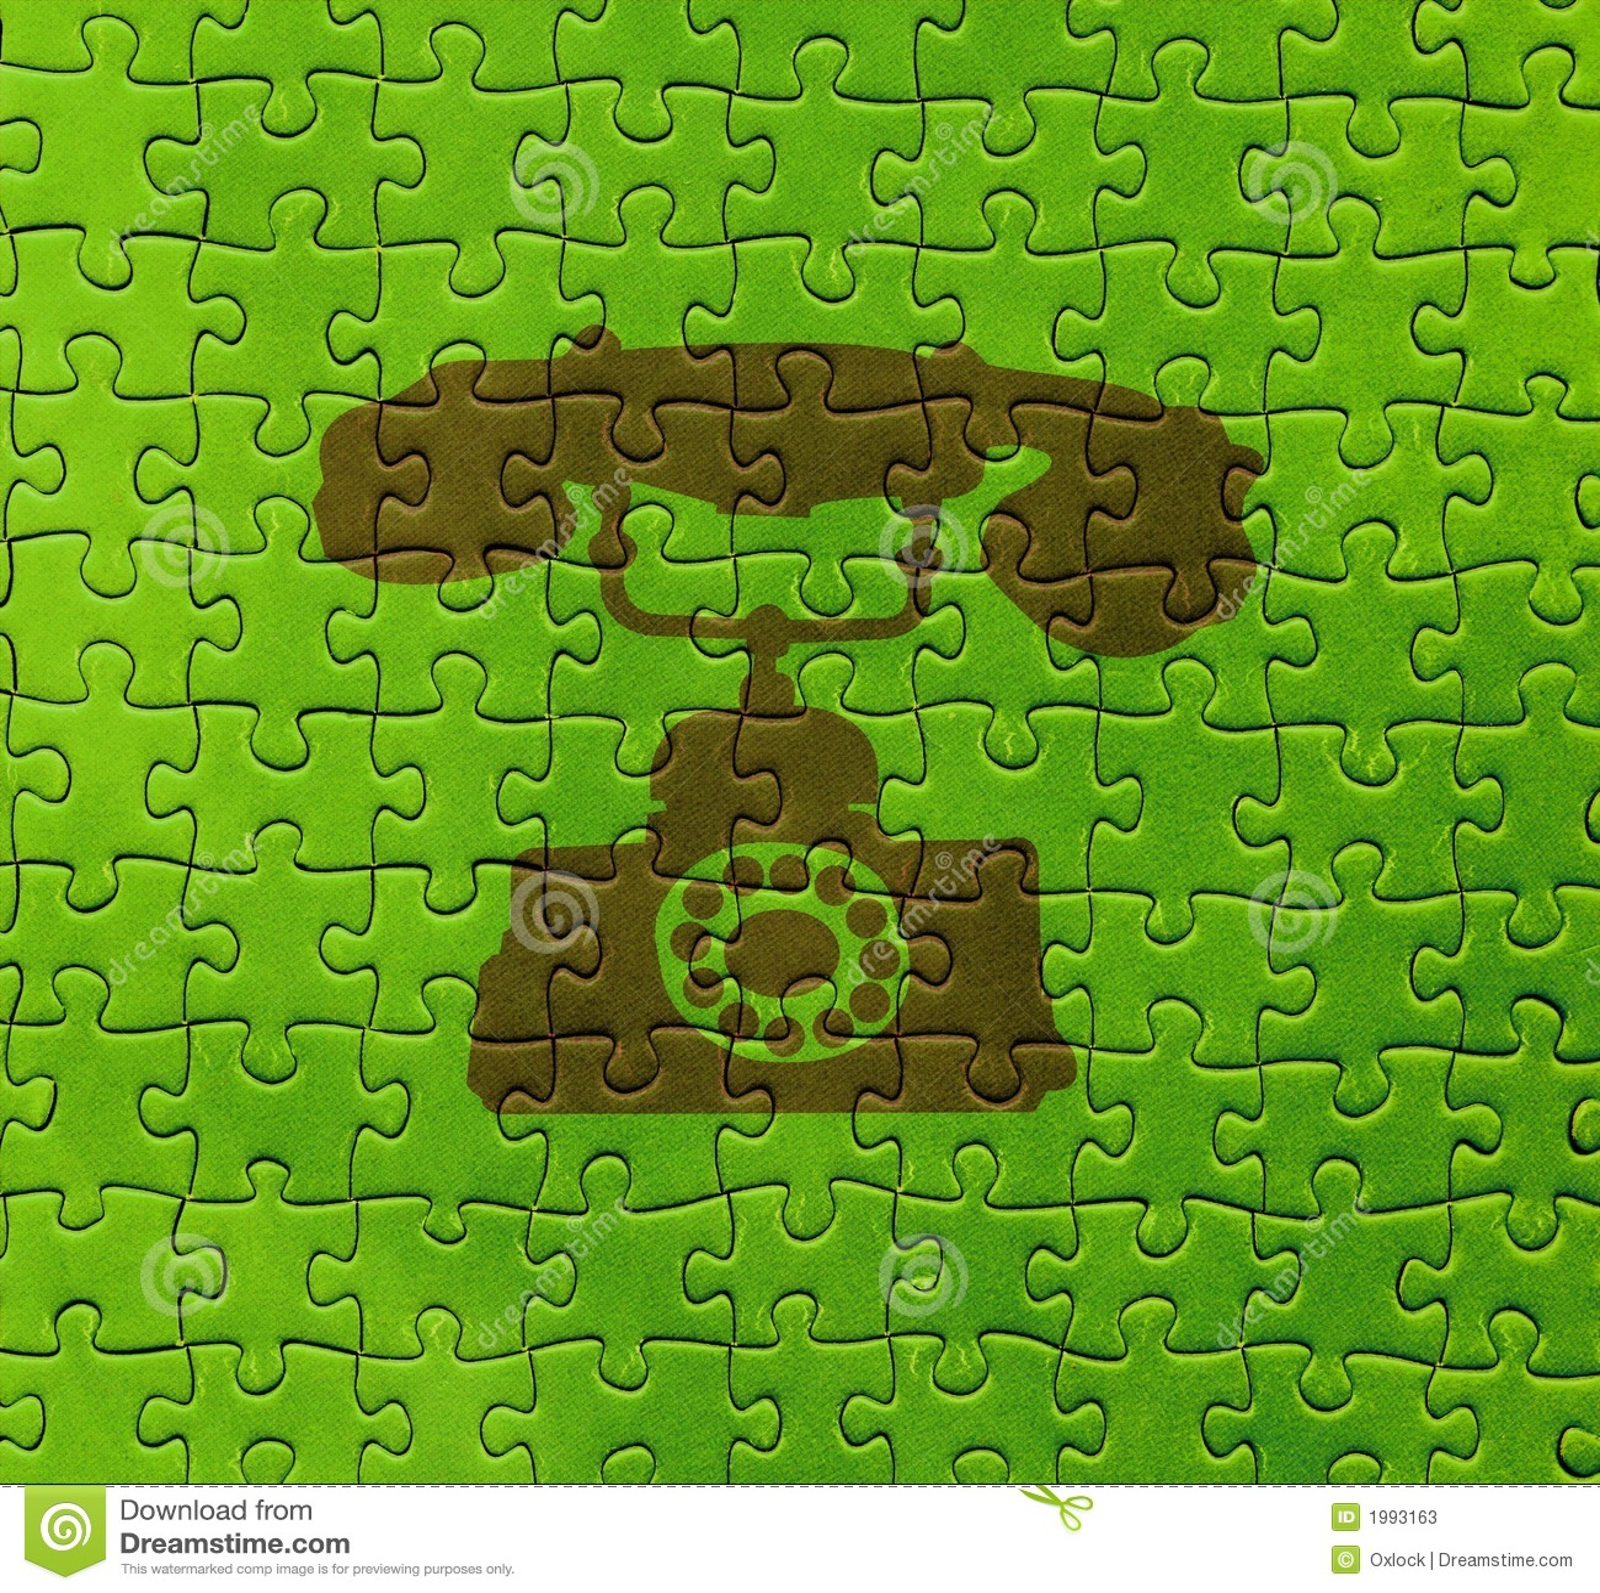 Telephone on puzzle texture